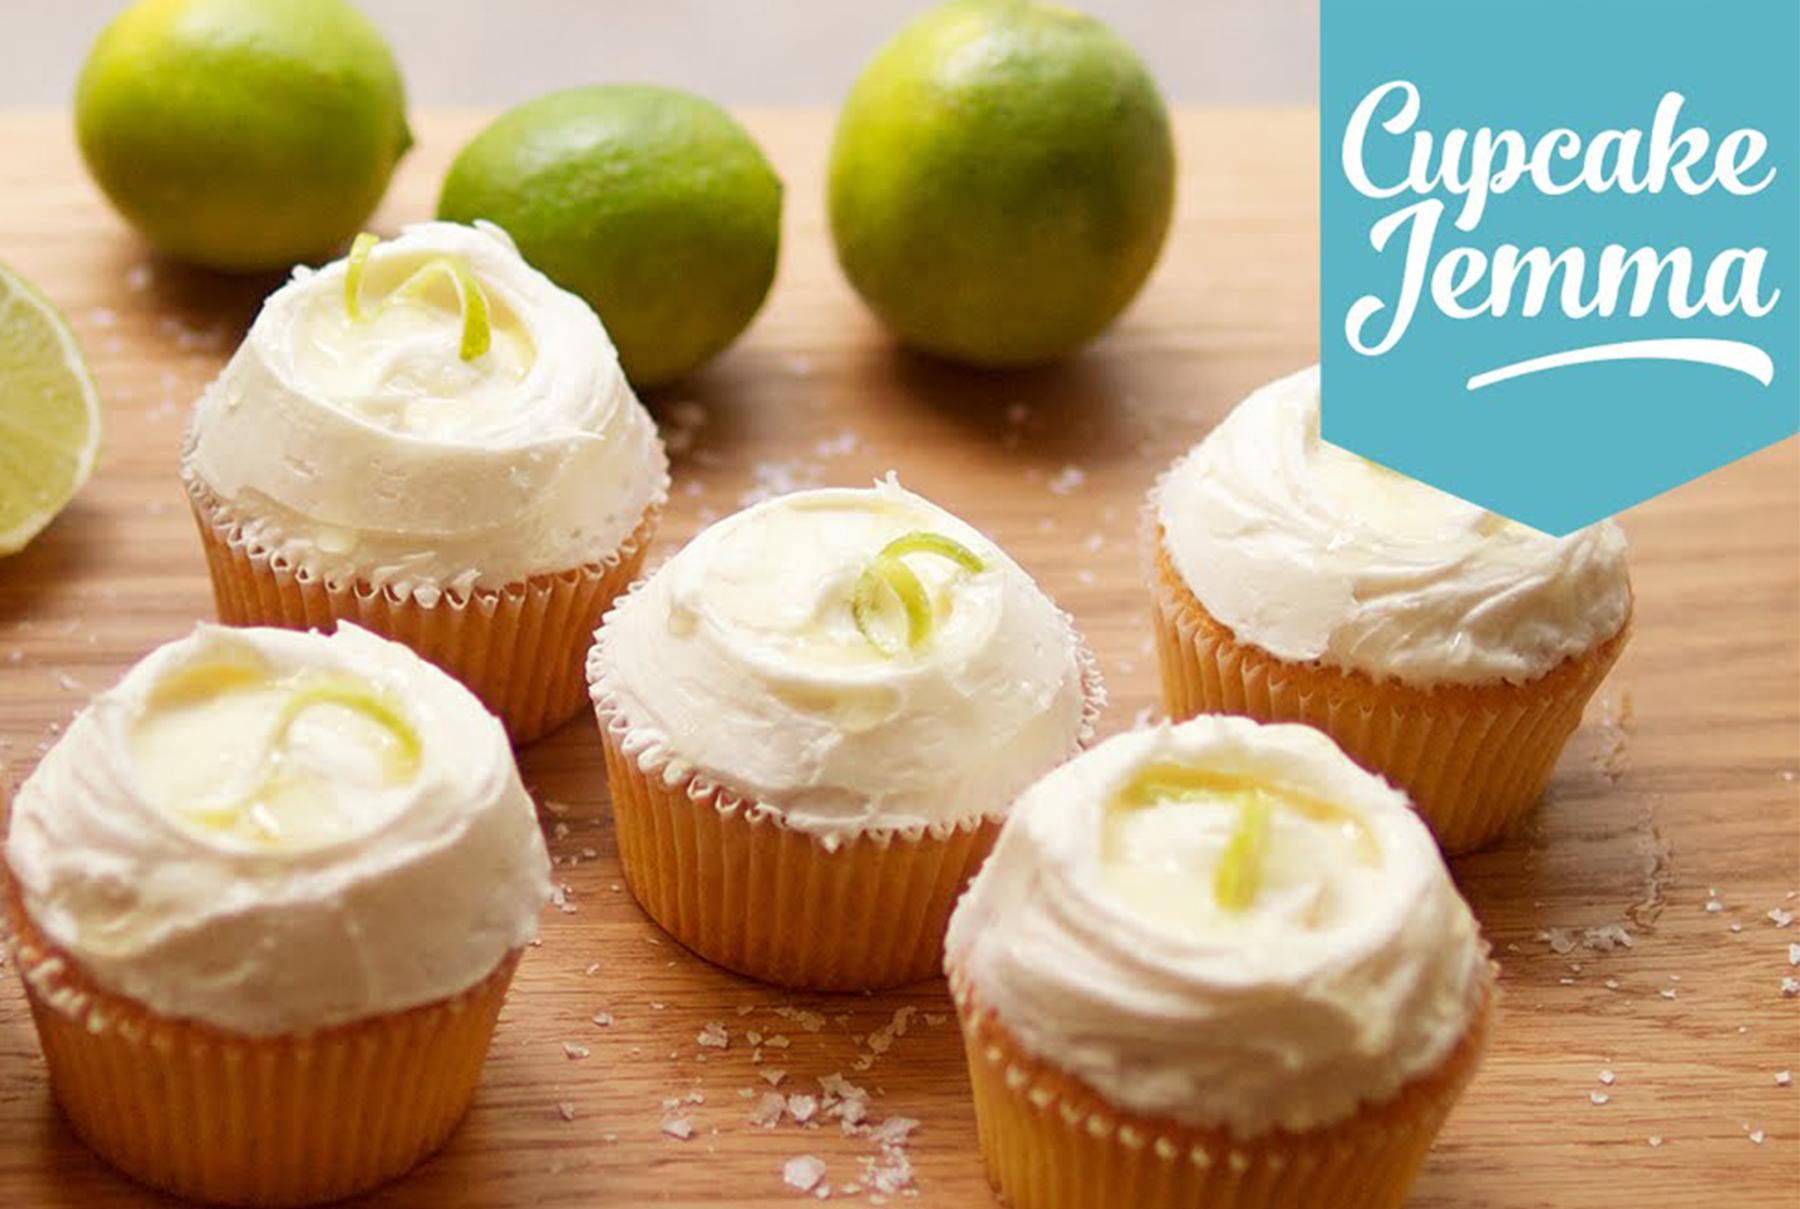 Cupcake Jemma - header